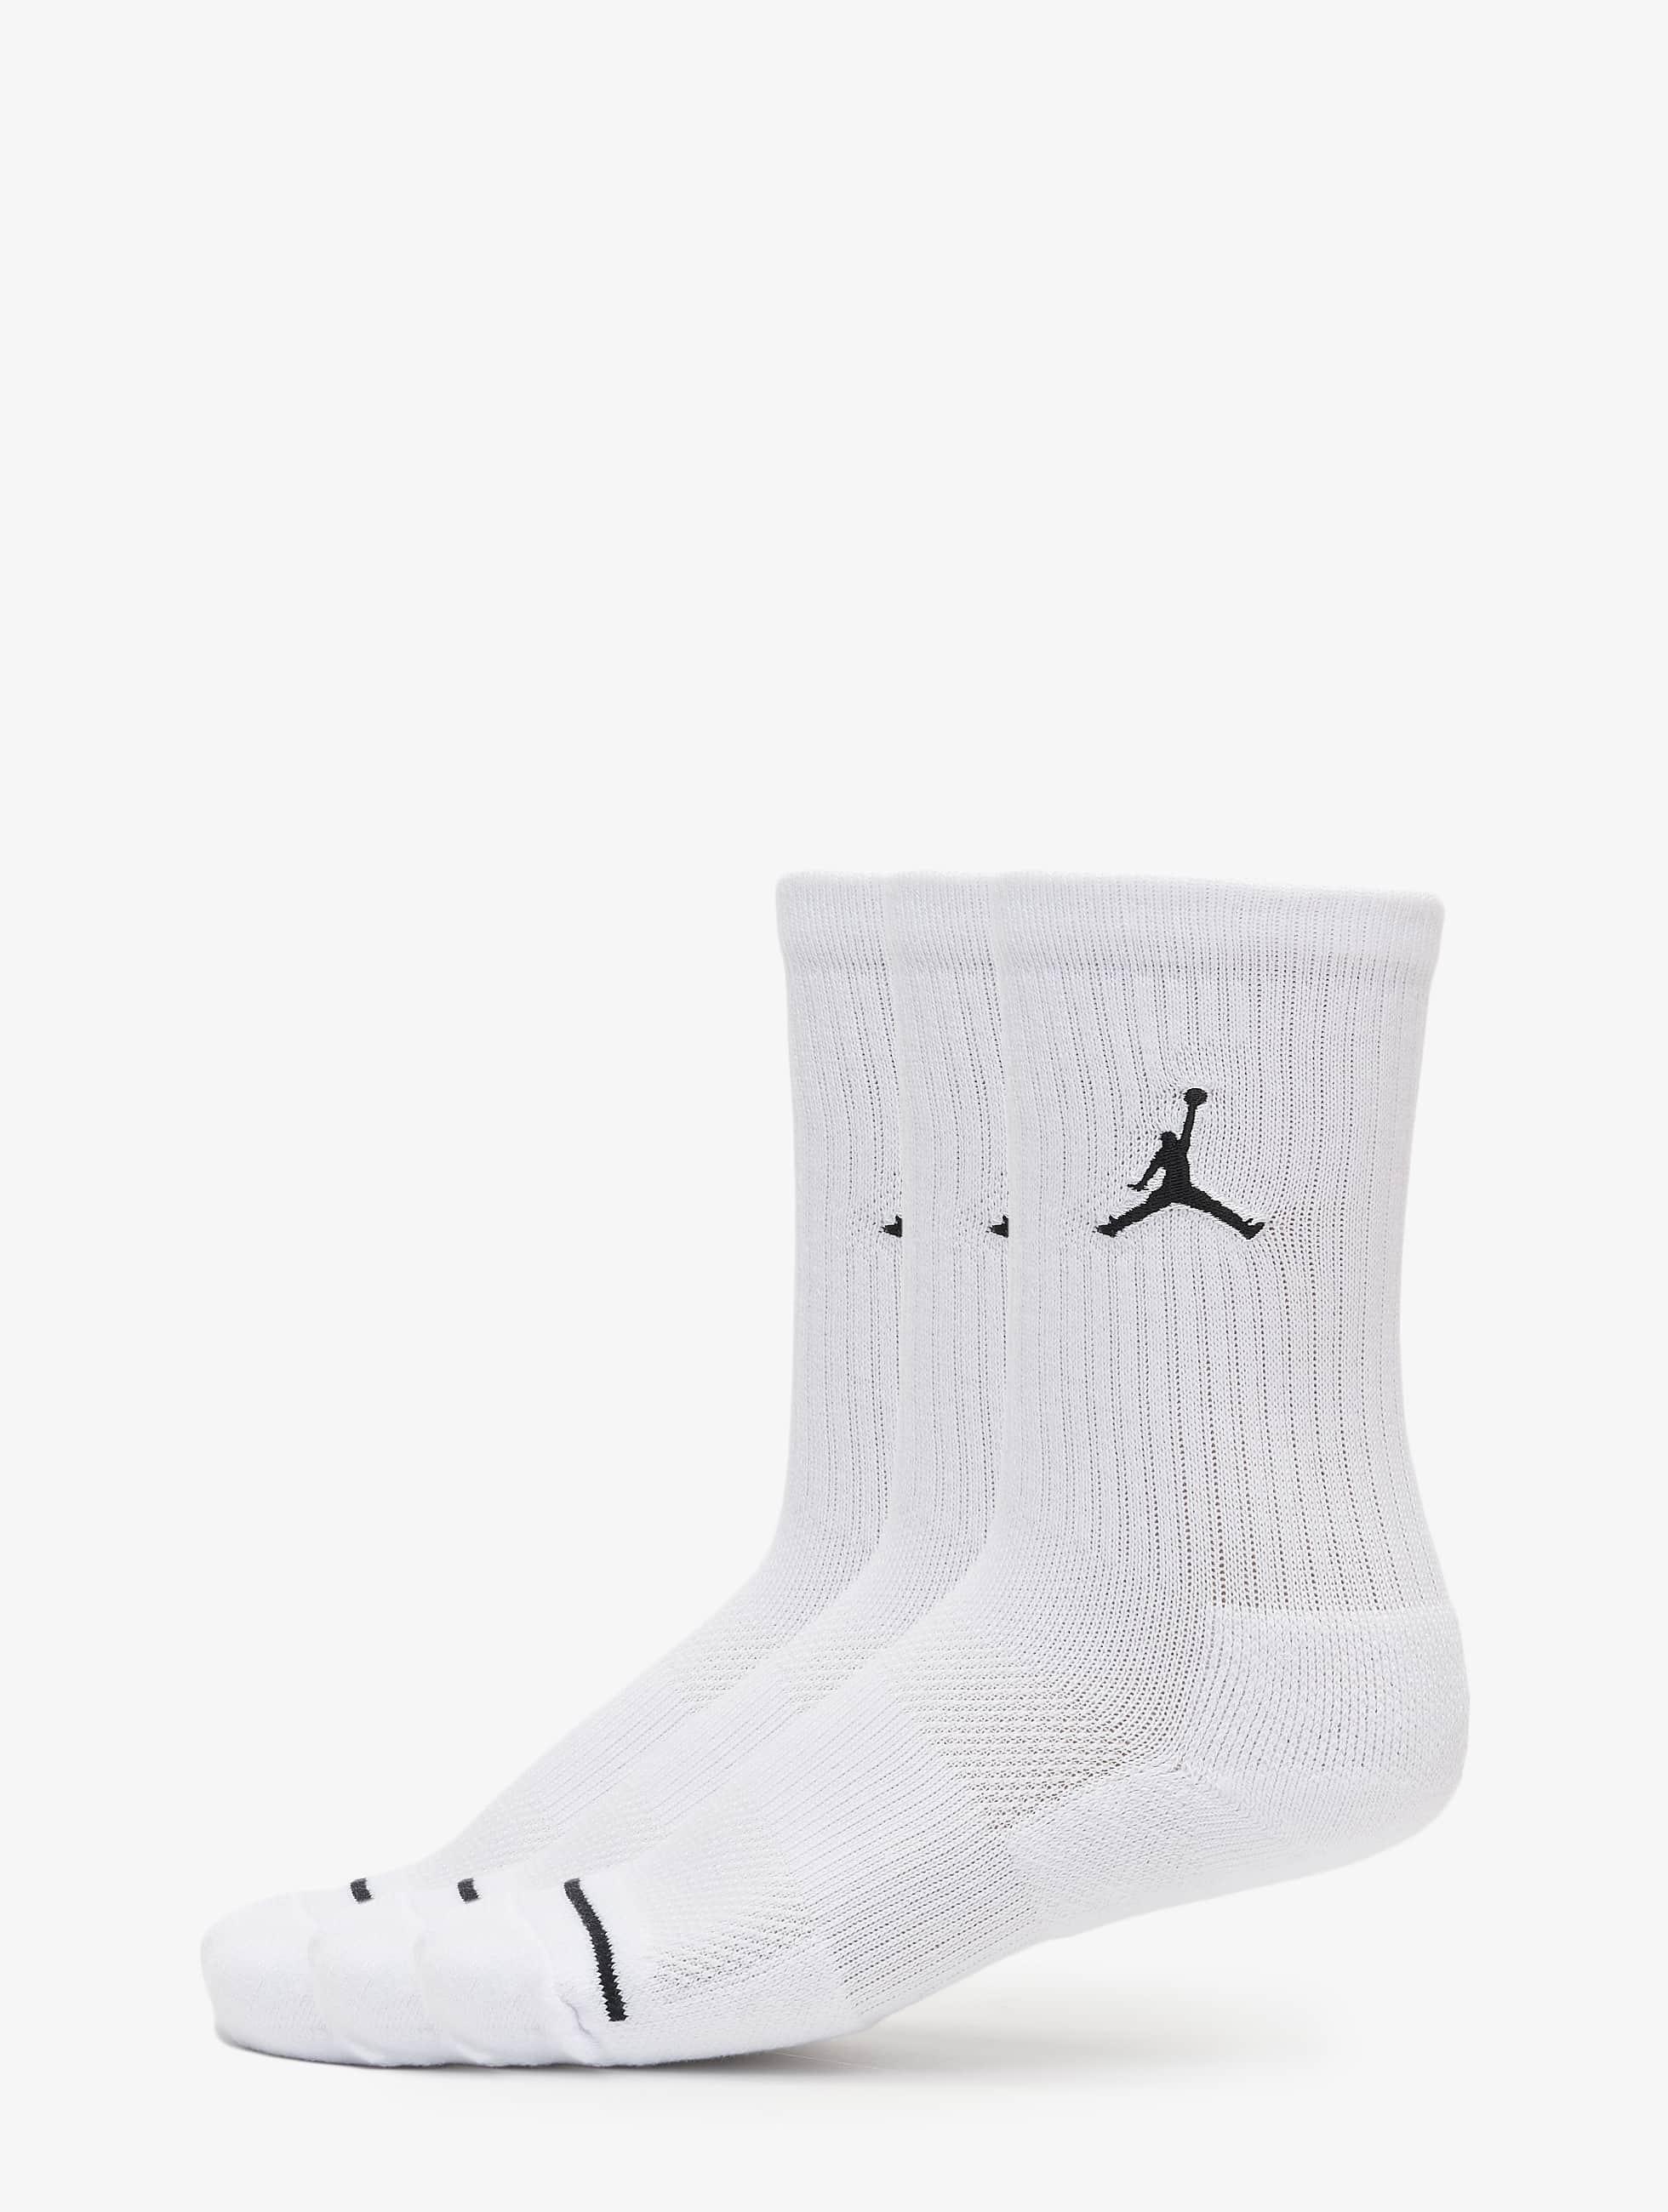 Jordan Männer Socken 3 Pack Cotton Crew in weiß